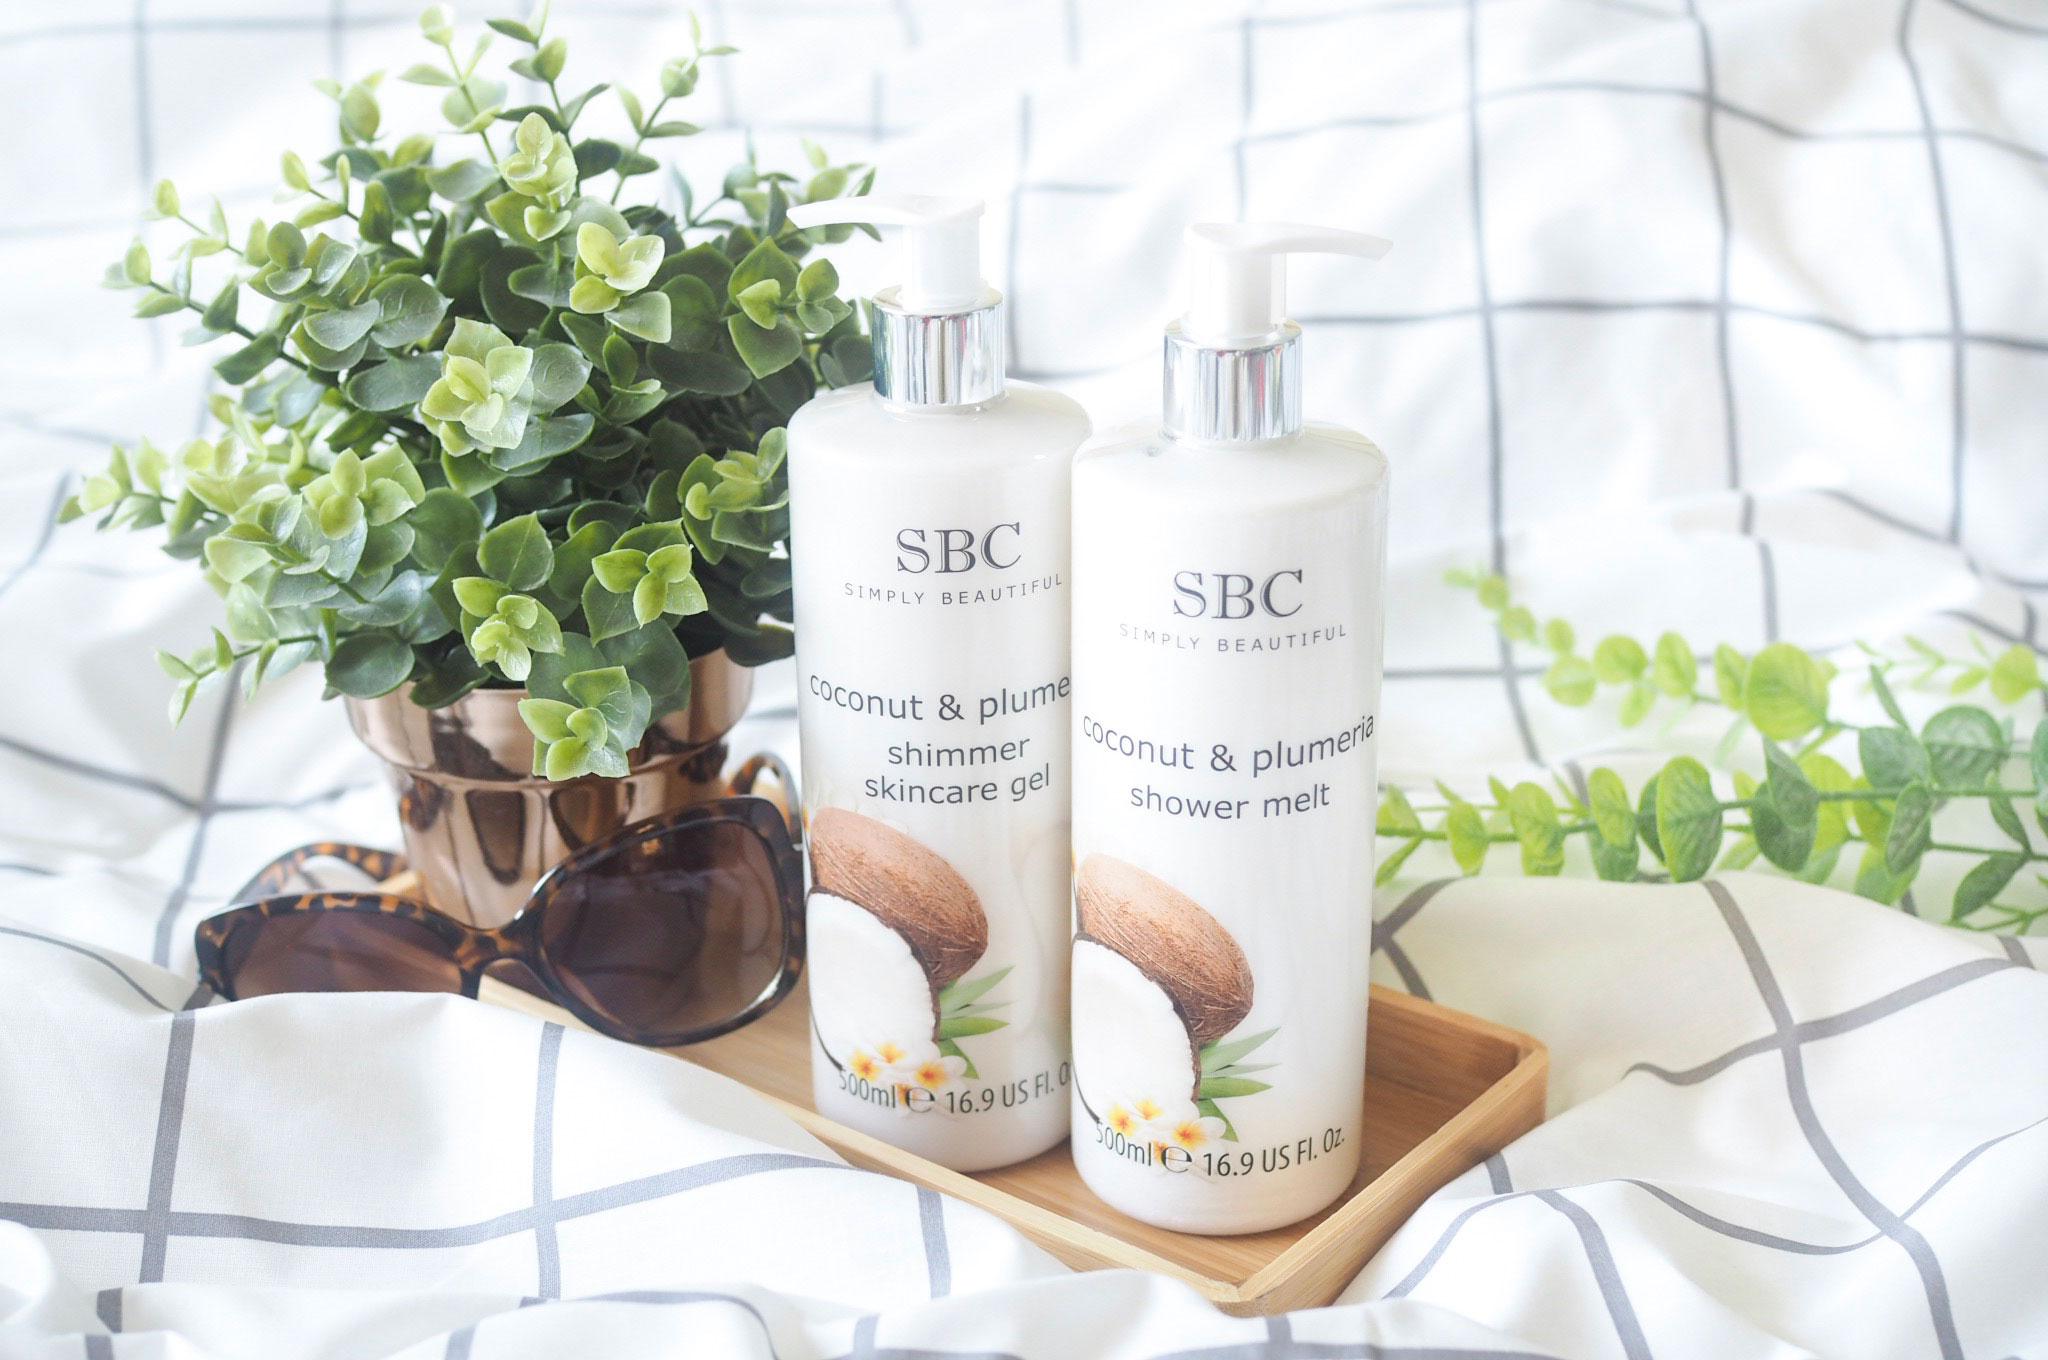 SBC Coconut & Plumeria Review